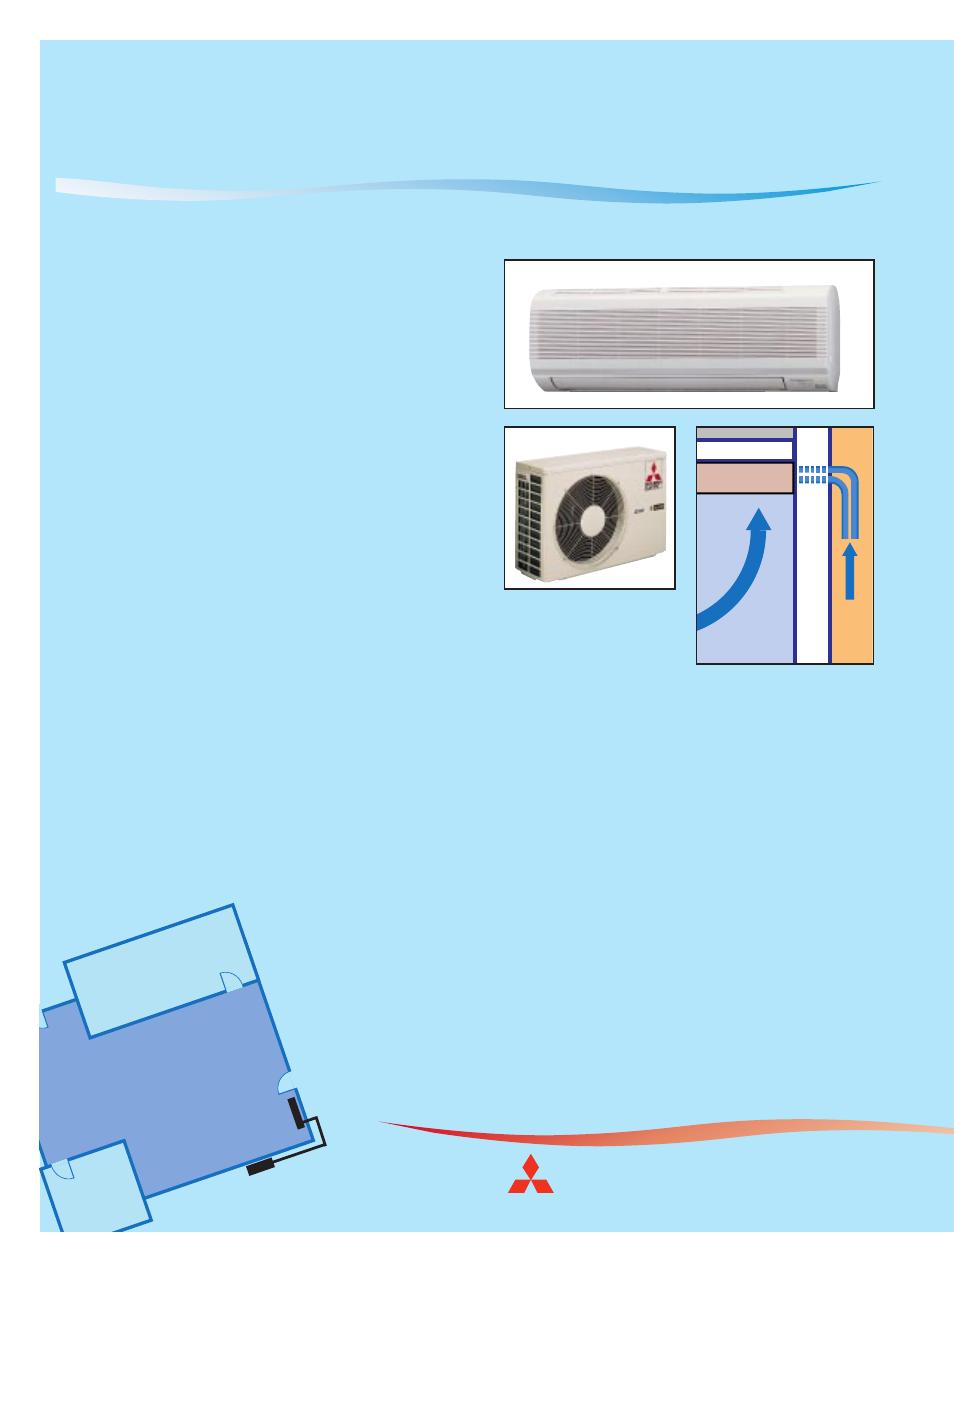 mr slim ductless air conditioners and heat pumps comfort made rh manualsdir com Mitsubishi Montero Limited Repair Parts 2005 Mitsubishi Lancer Manual PDF